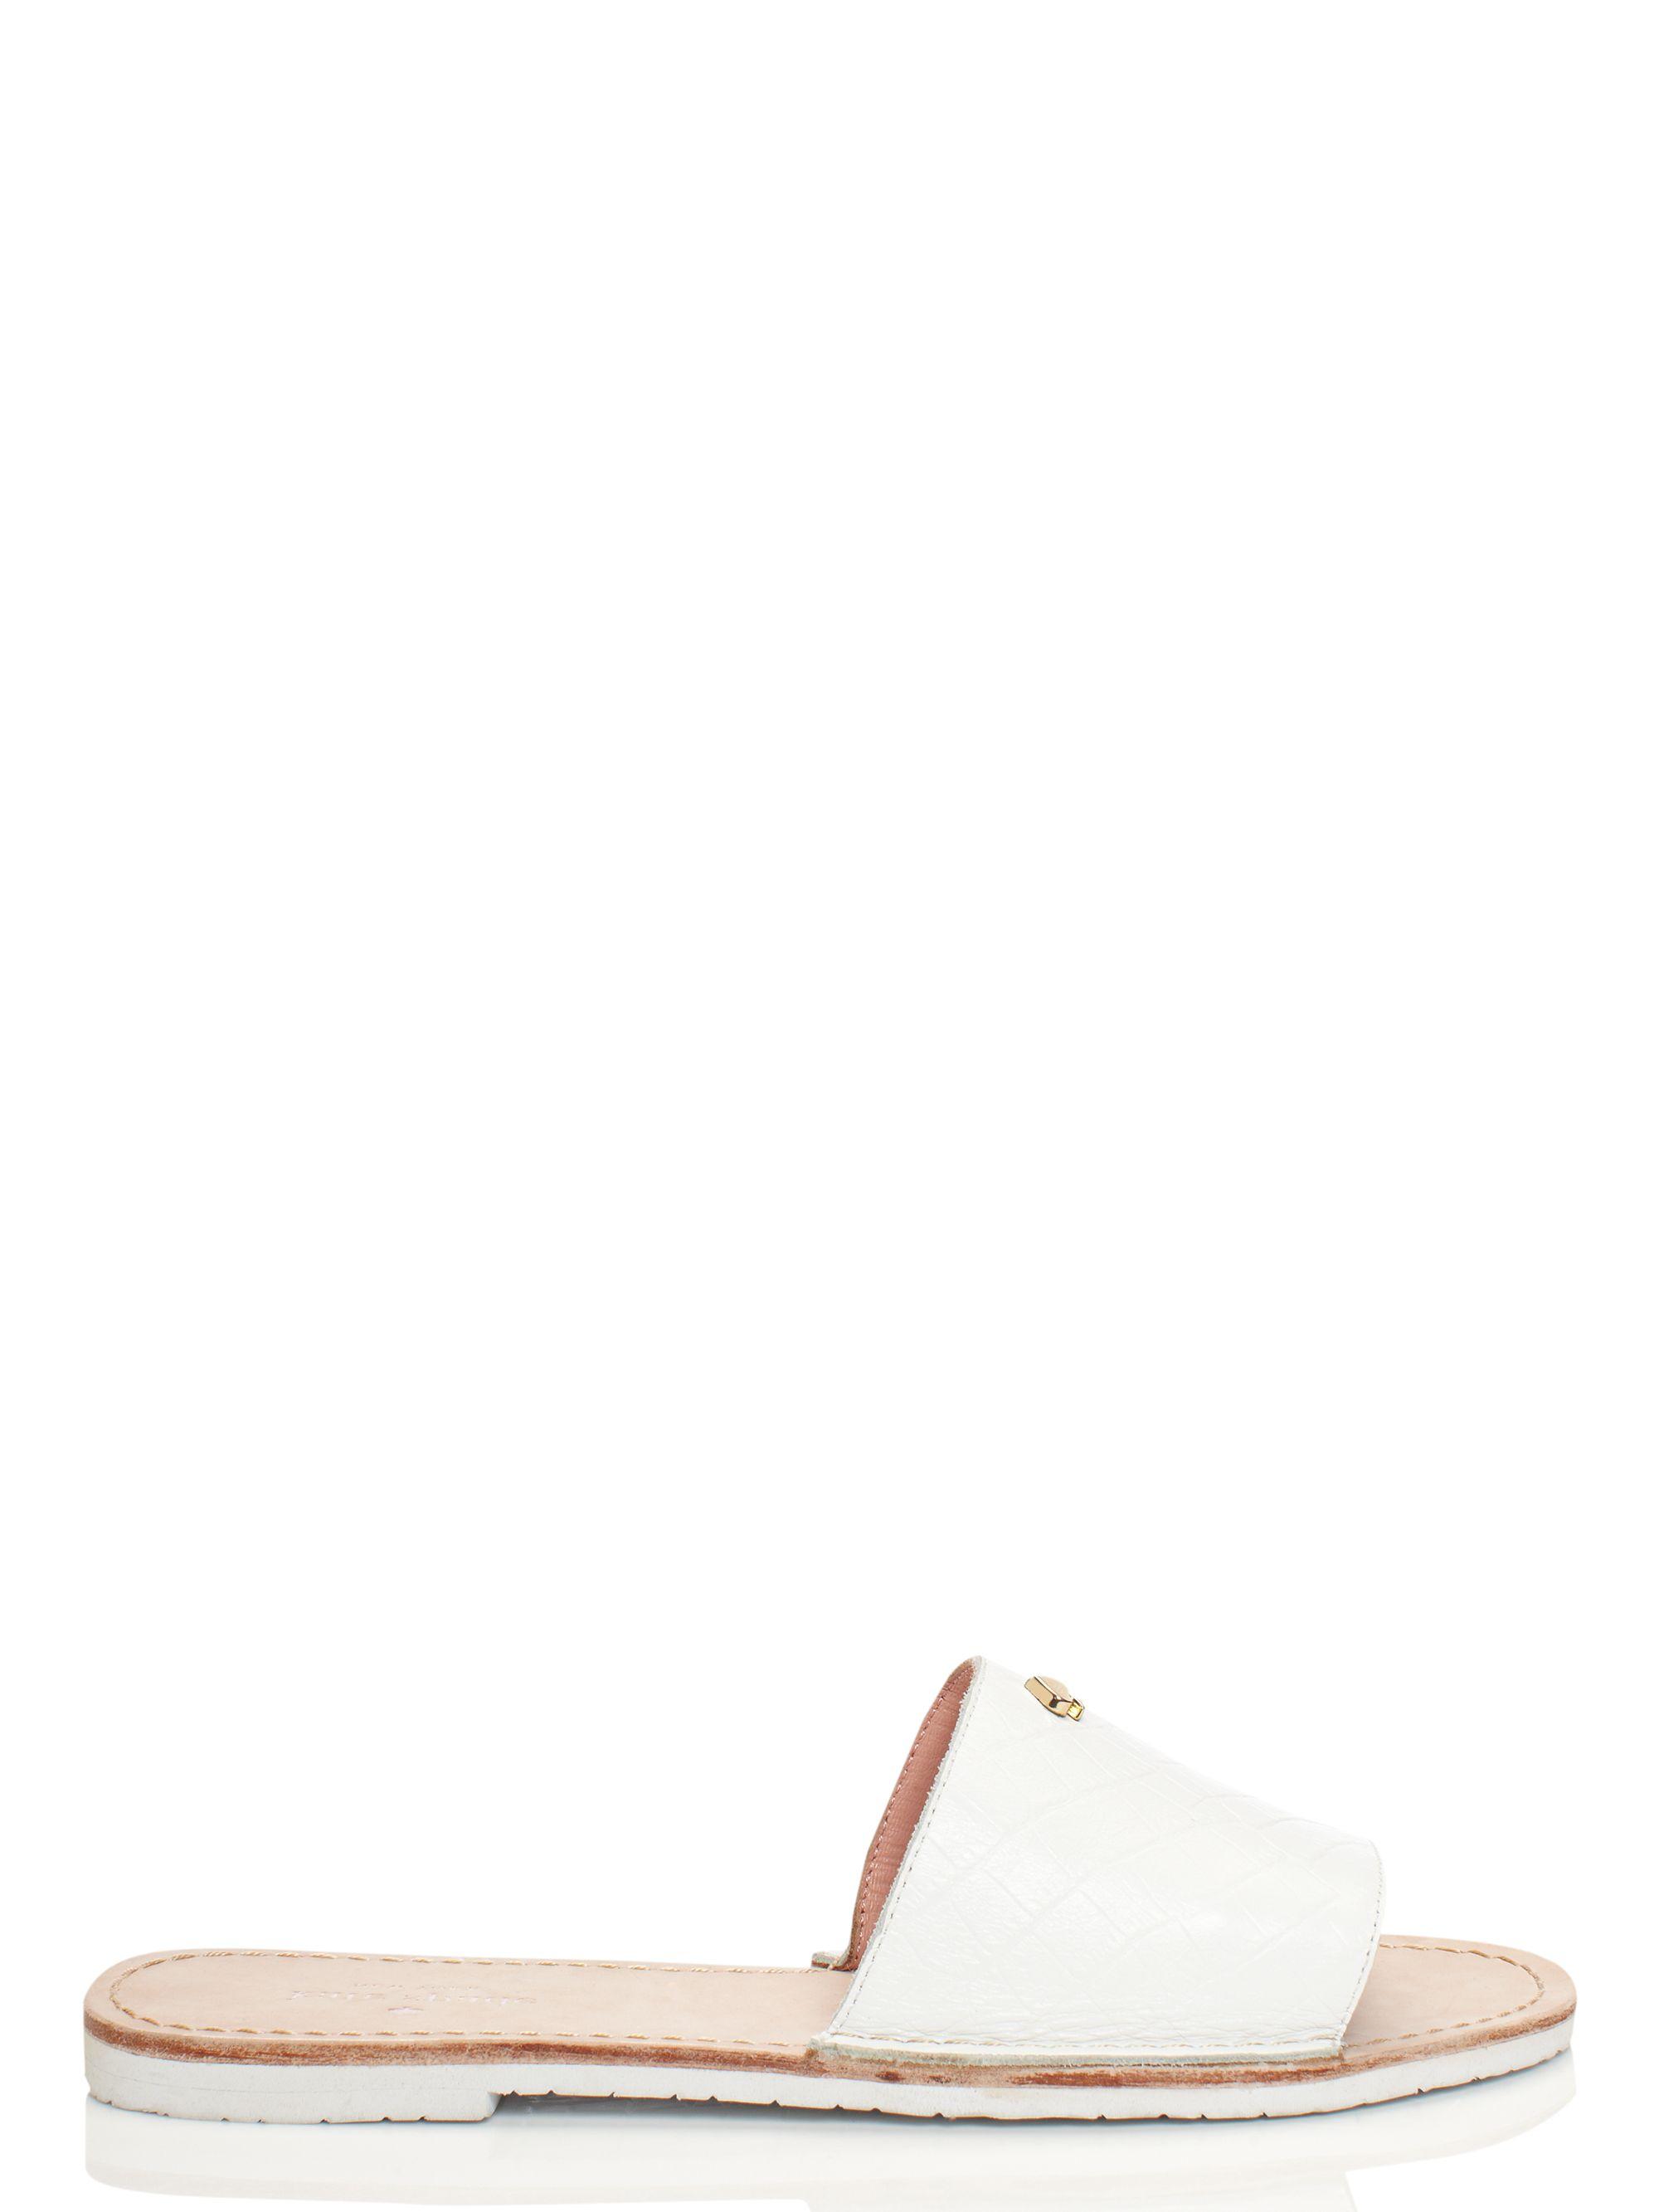 e47d6d885f31 Kate Spade Imperiale Sandals in White - Lyst